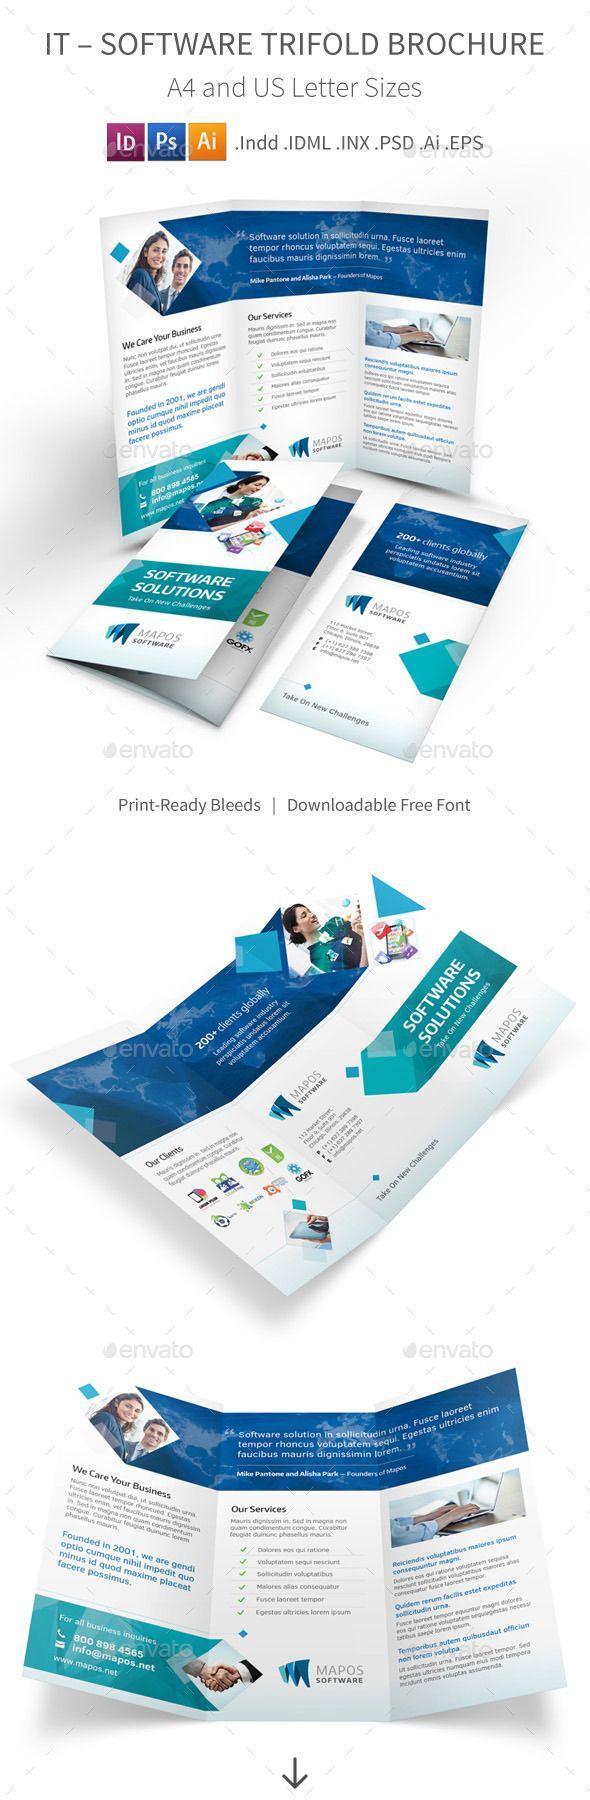 IT – Software Trifold Brochure #design Download: http://graphicriver.net/item/it-software-trifold-brochure/9989957?ref=ksioks